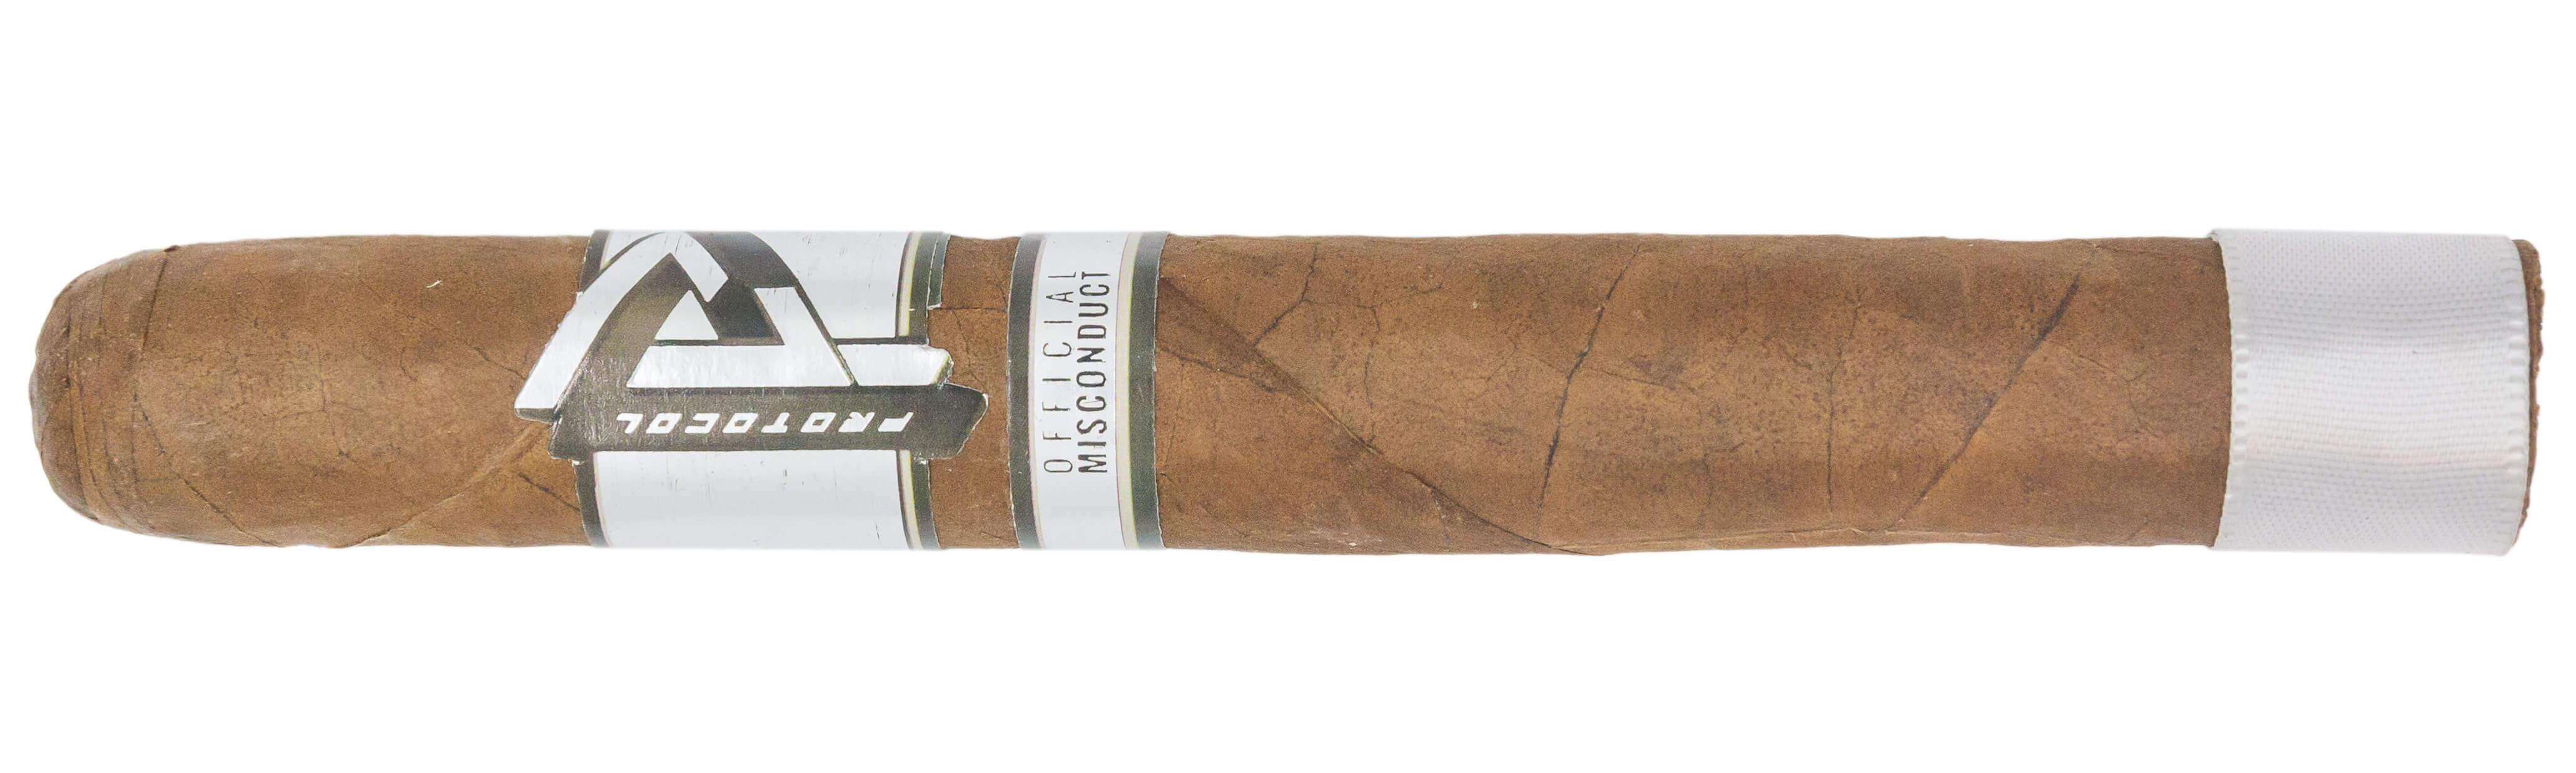 Blind Cigar Review: Cubariqueño | Protocol Official Misconduct Corona Gorda